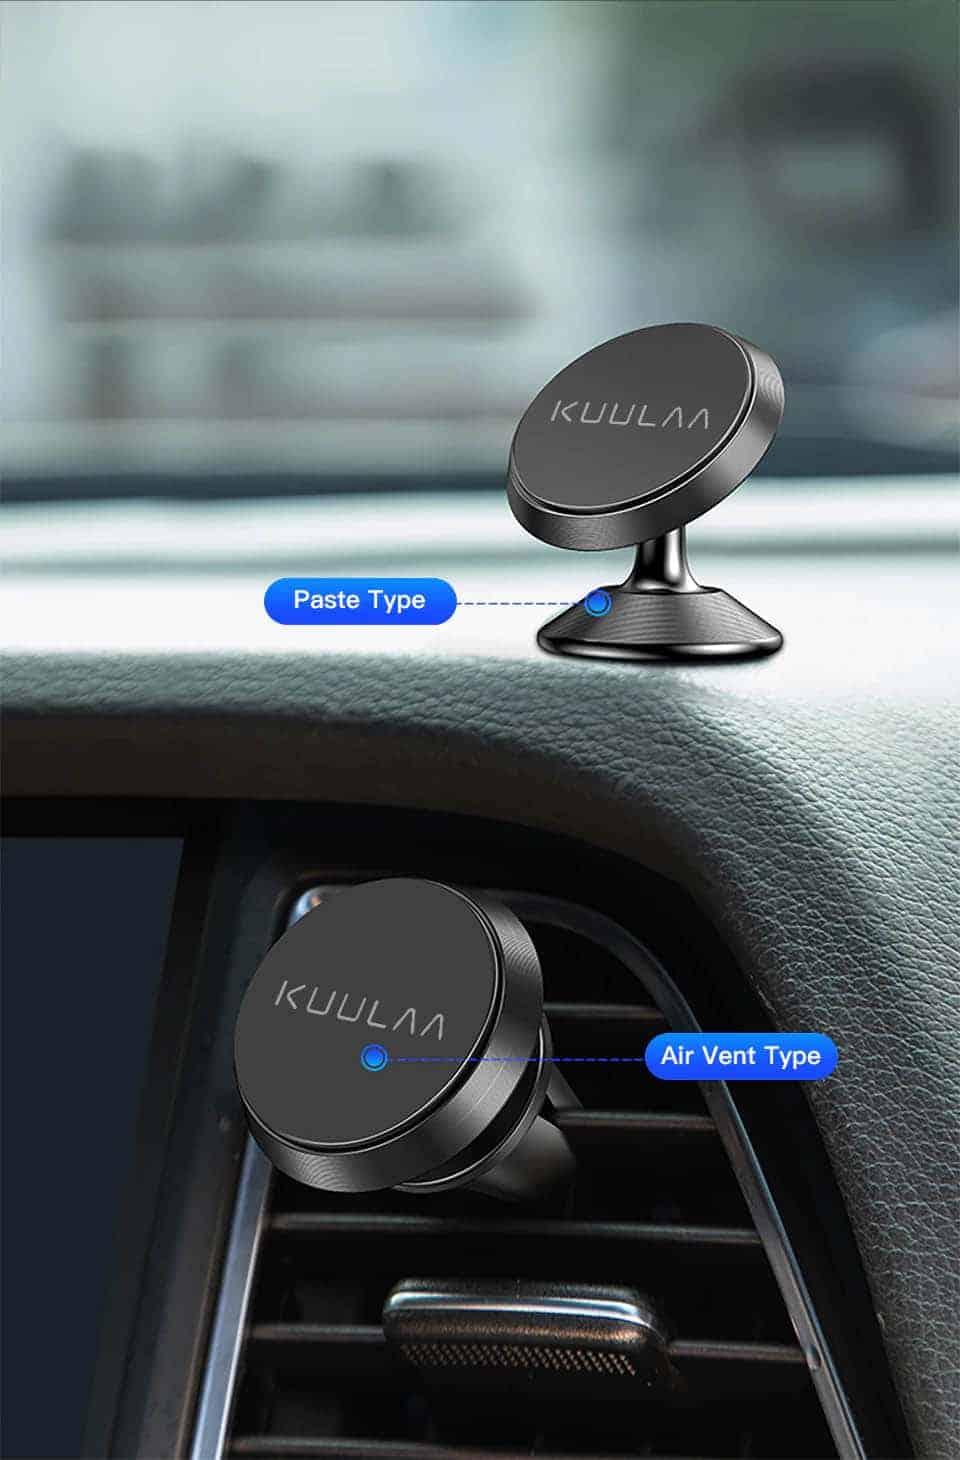 KUULAA Car Phone Holder Magnetic Paste type